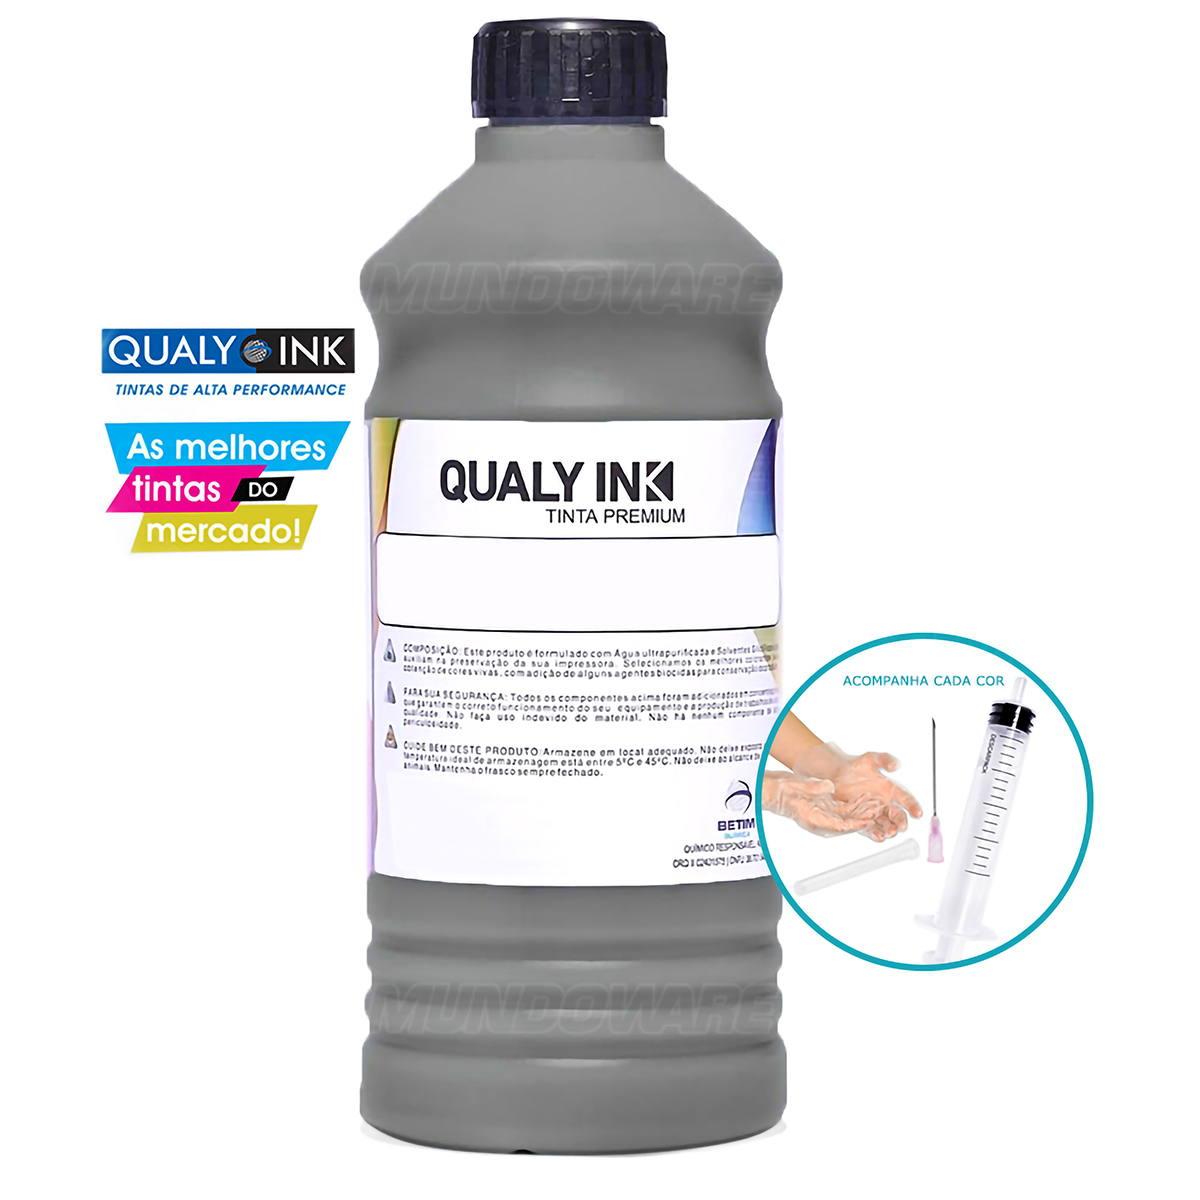 Compatível: Tinta Corante Qualy-Ink BC1H-1003 para Recarga de Cartuchos HP série 3000 Preto 1L